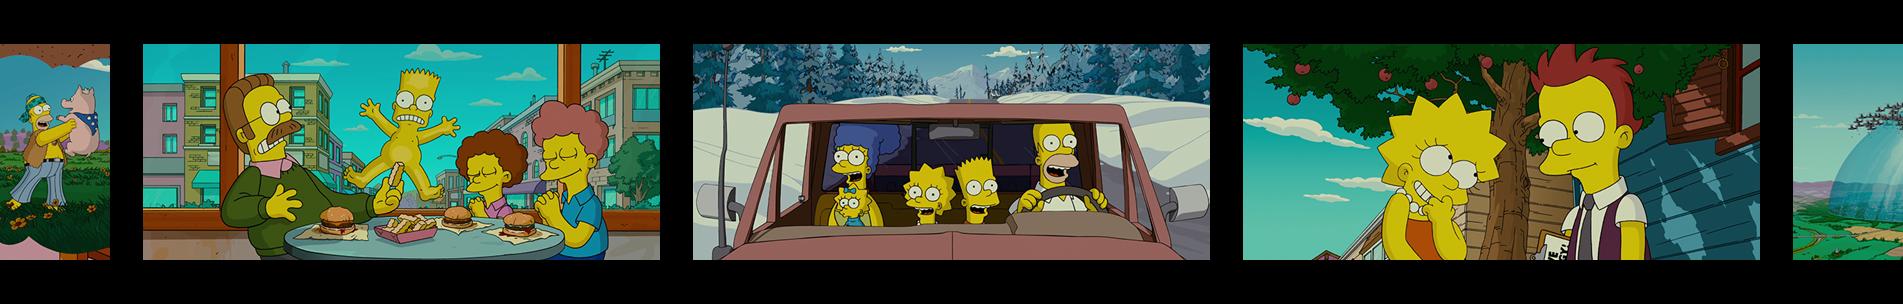 "Pellicule ""Les Simpson : Le Film"""